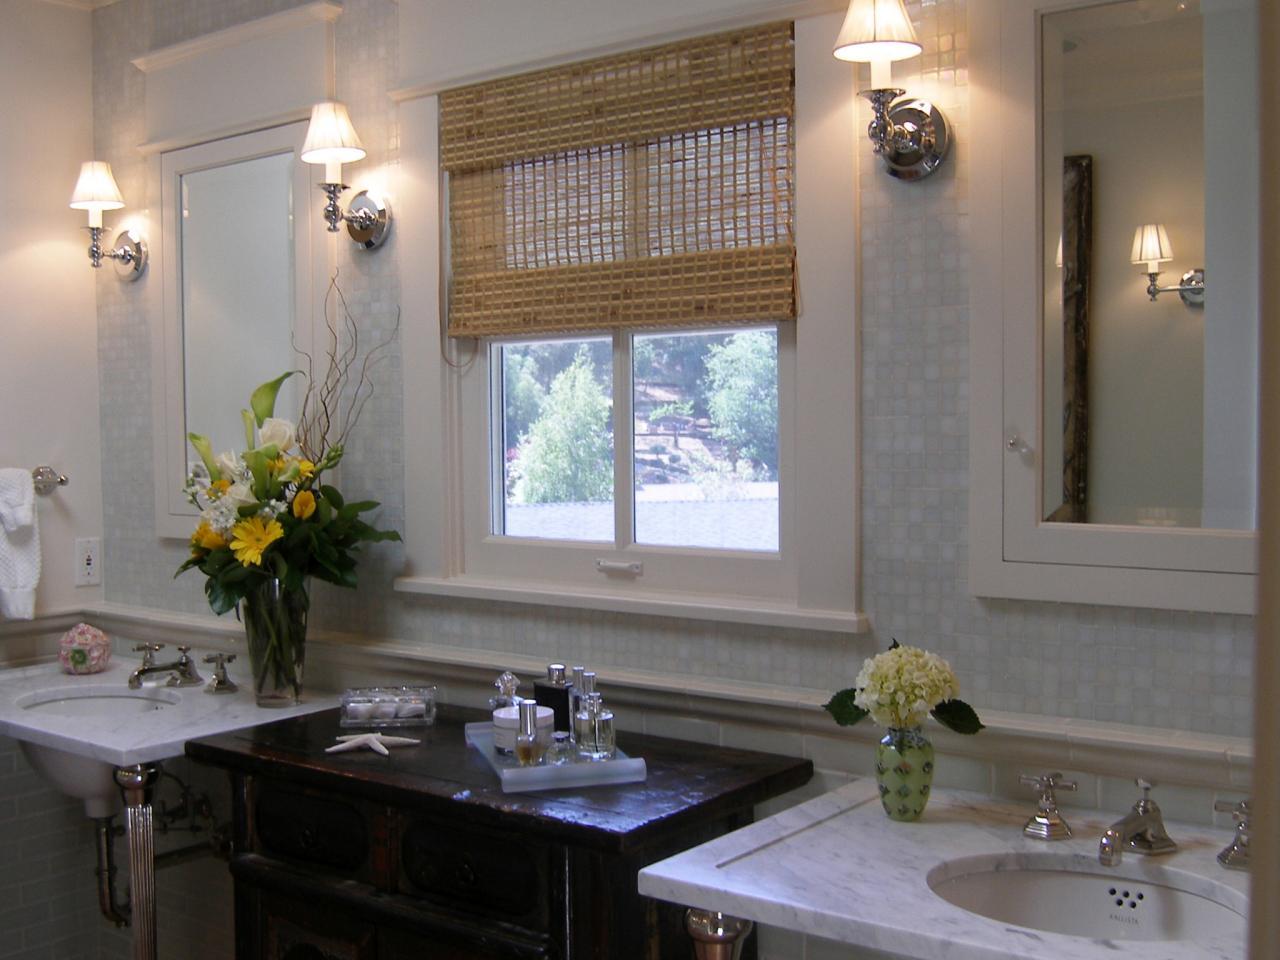 Gilder-Lori-Traditional-Vanity-Bathroom_s4x3.jpg.rend.hgtvcom.1280.960